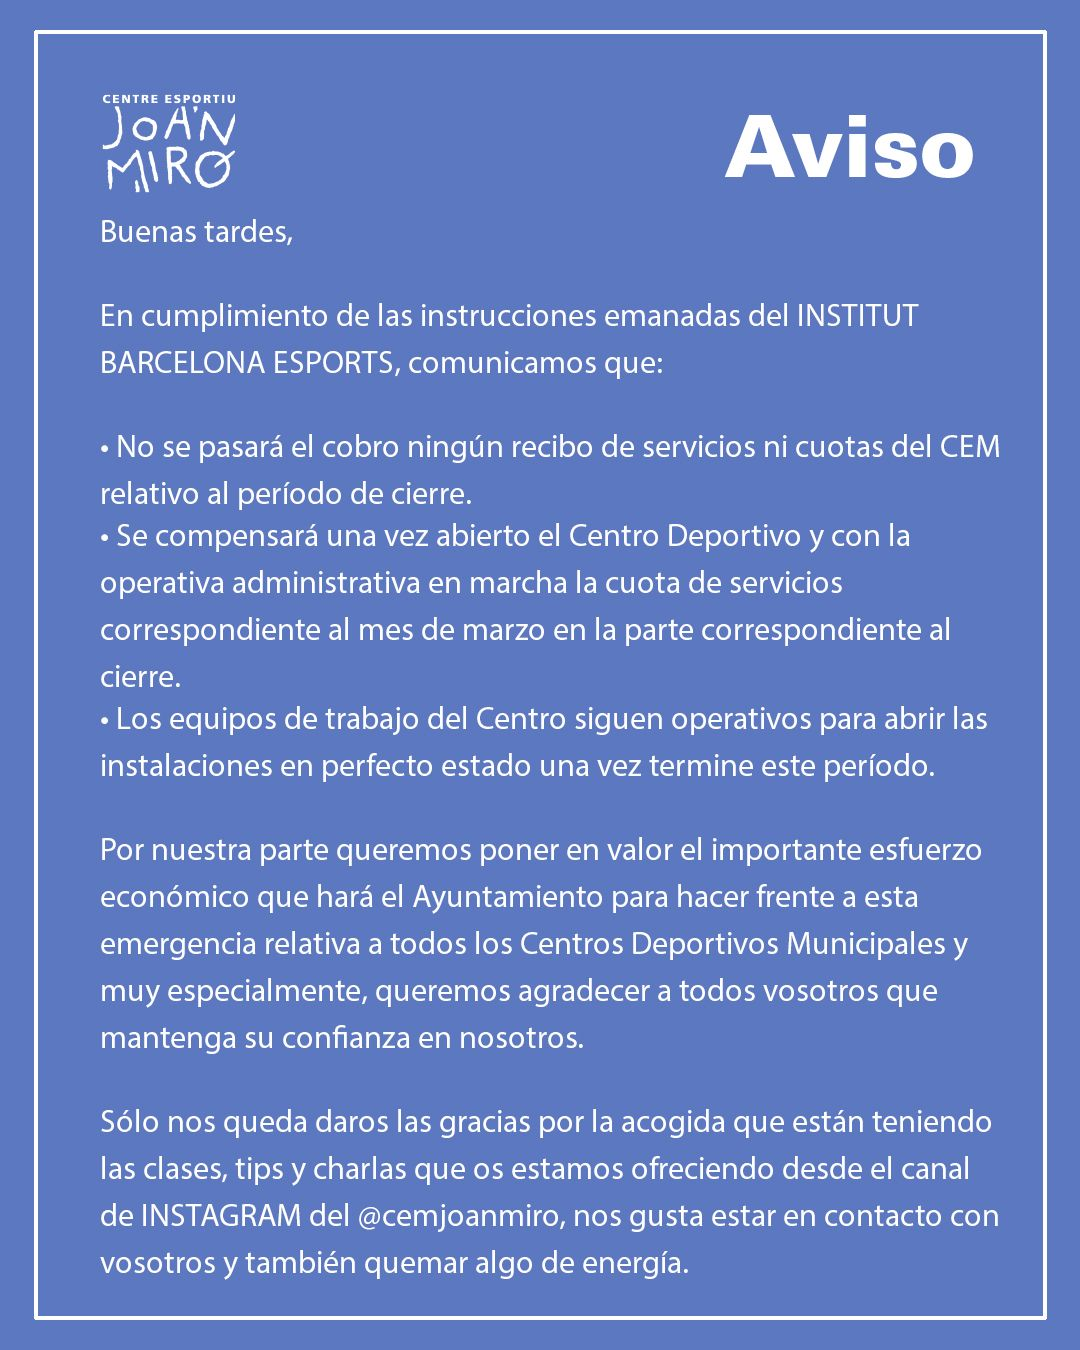 CEM gimnasio en barcelona comunicat CAST